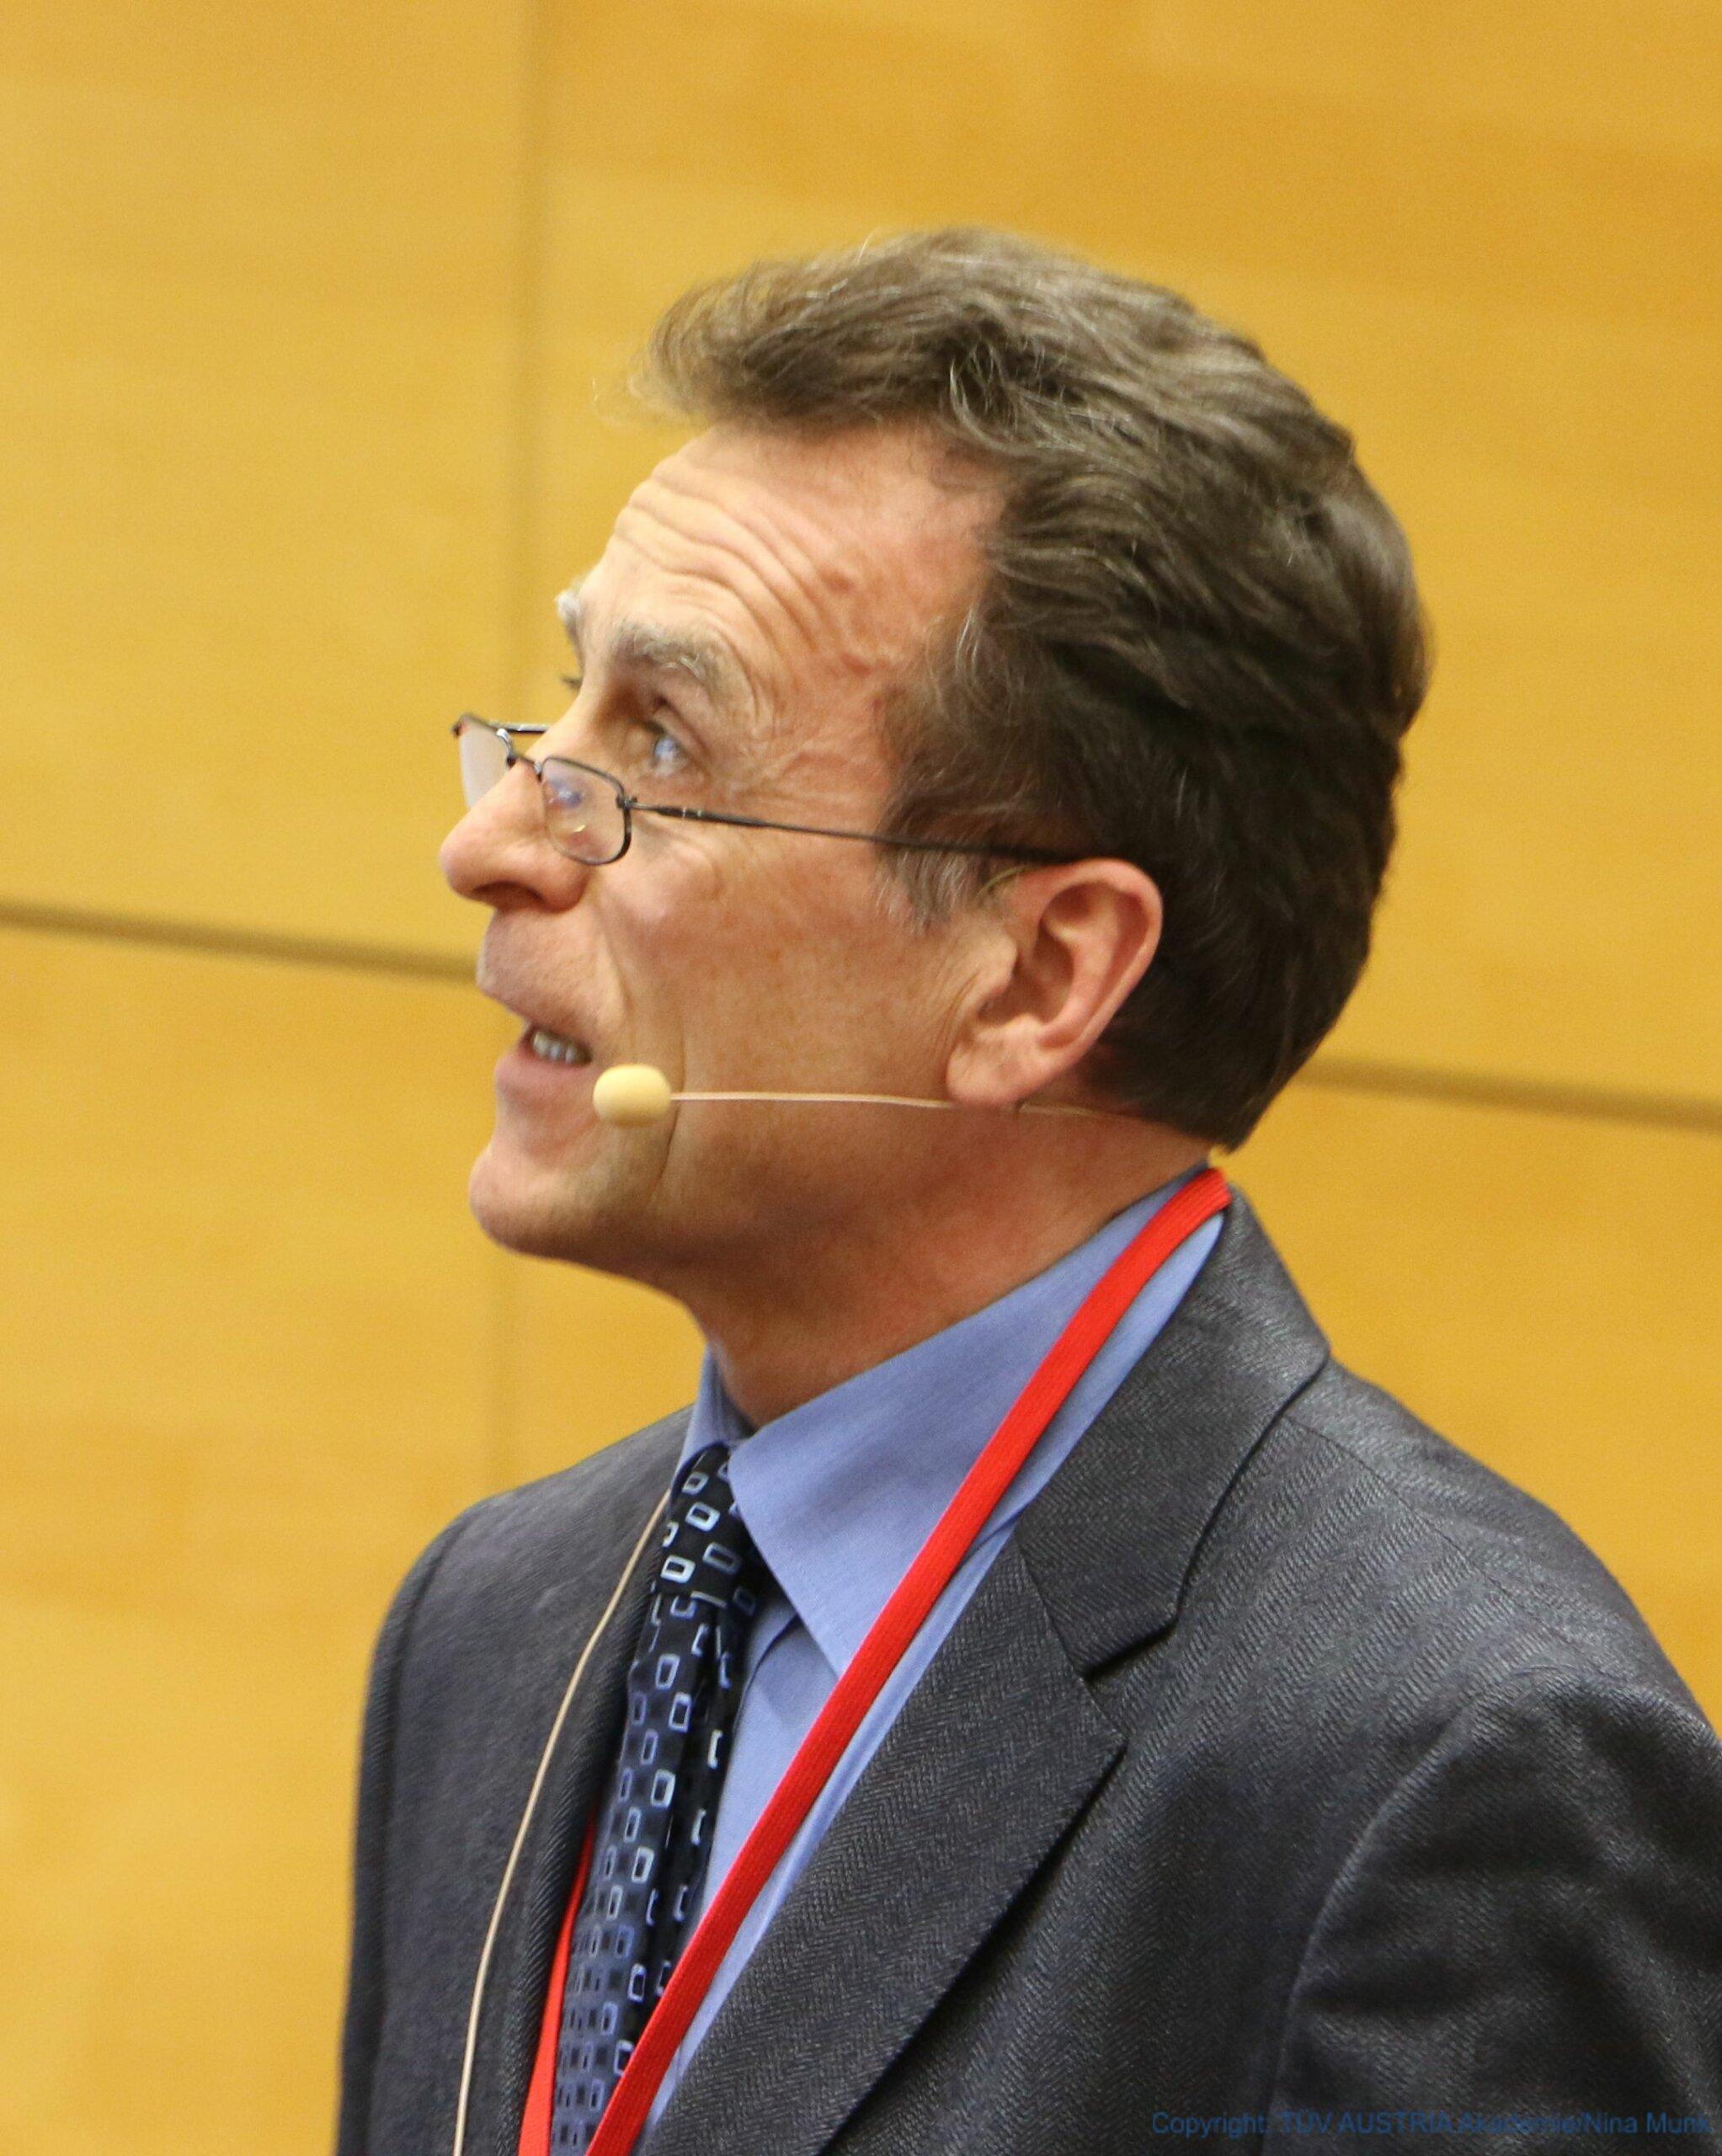 Karl Ponweiser Profilbild